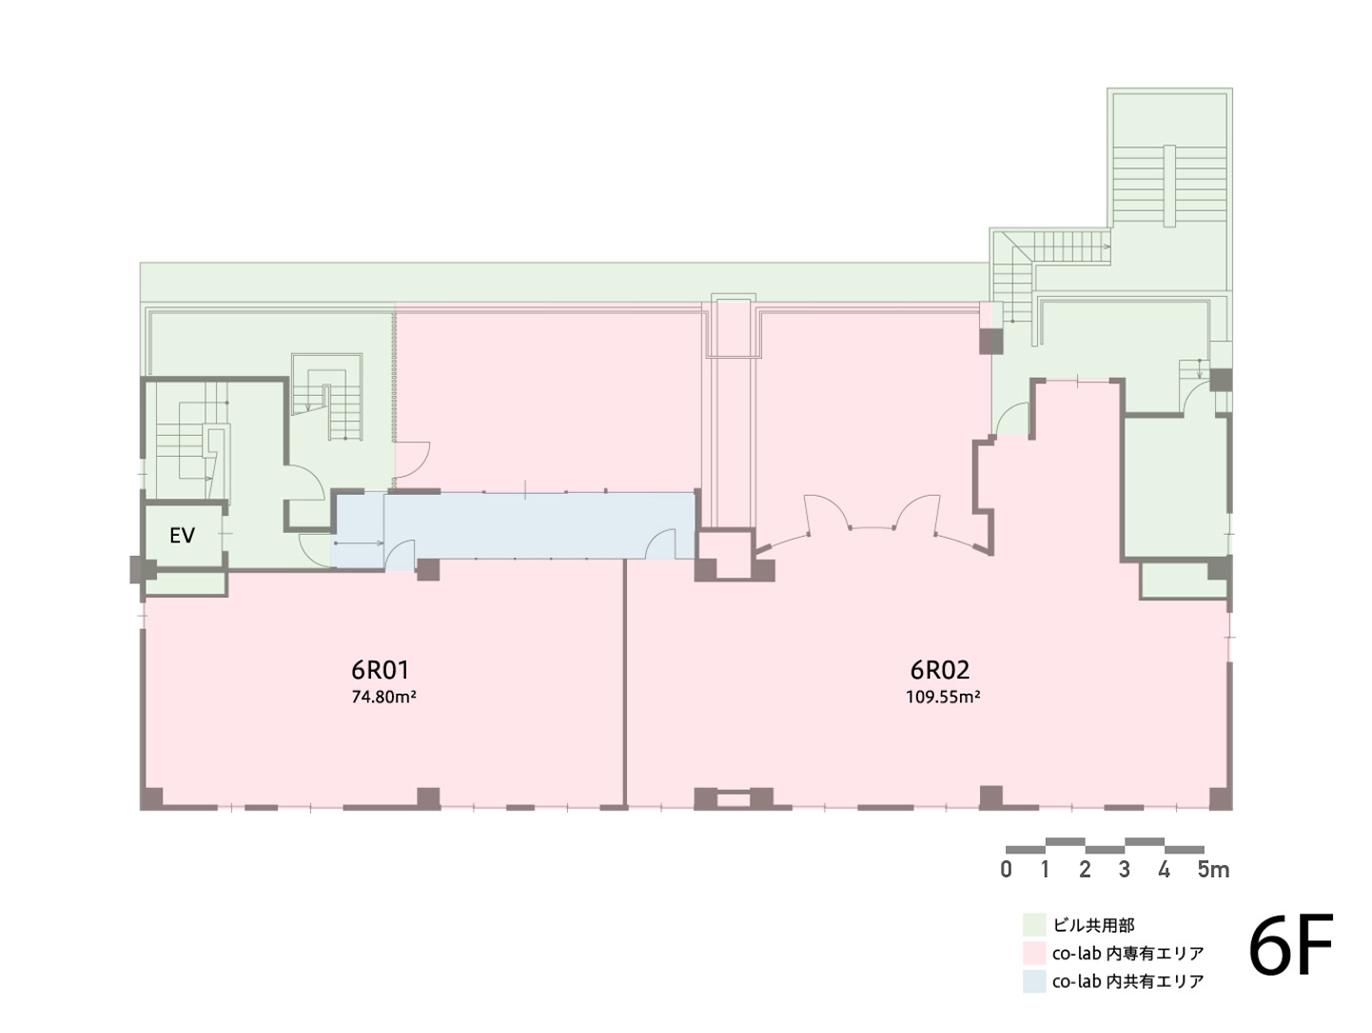 Co-Lab Taikanyama, Tokyo